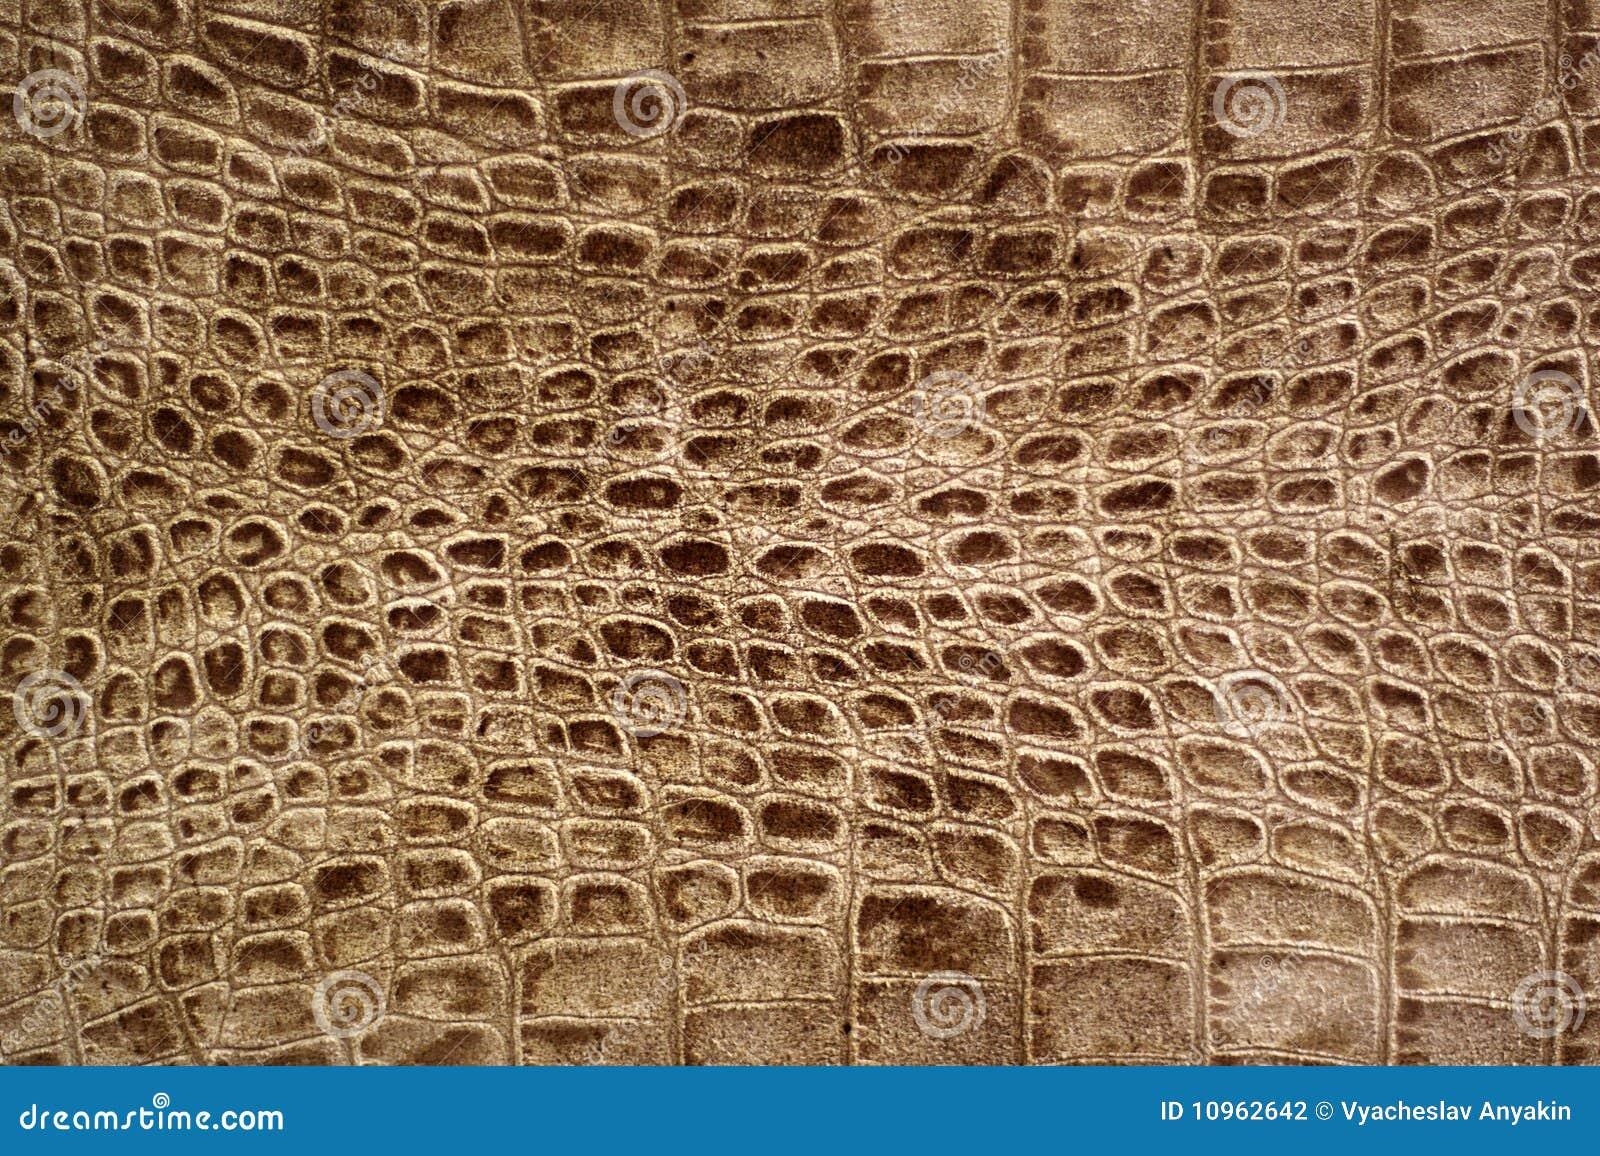 Snakeskin o struttura del coccodrillo